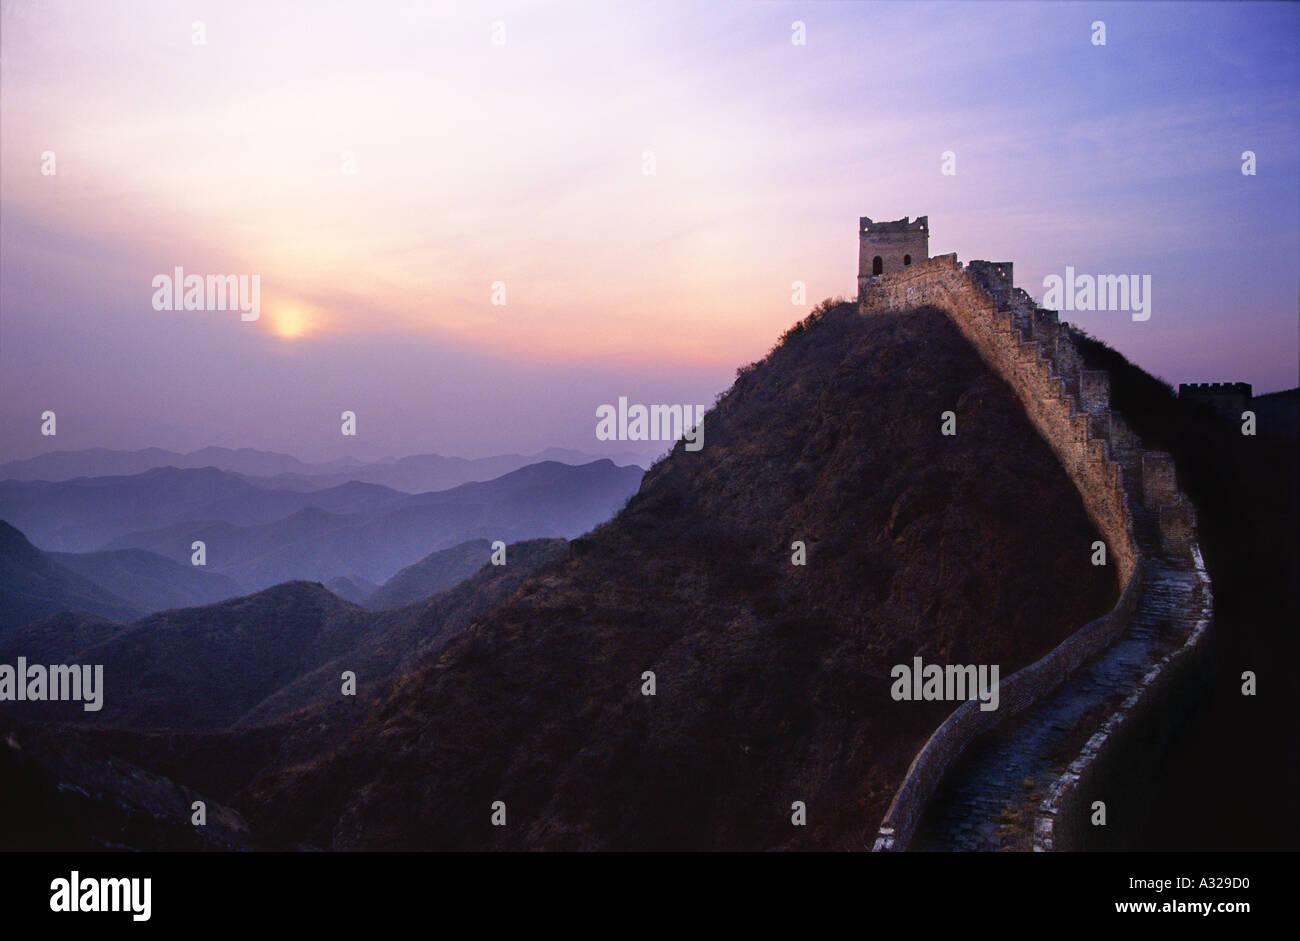 La Gran Muralla de China, cerca de Pekín, China Imagen De Stock